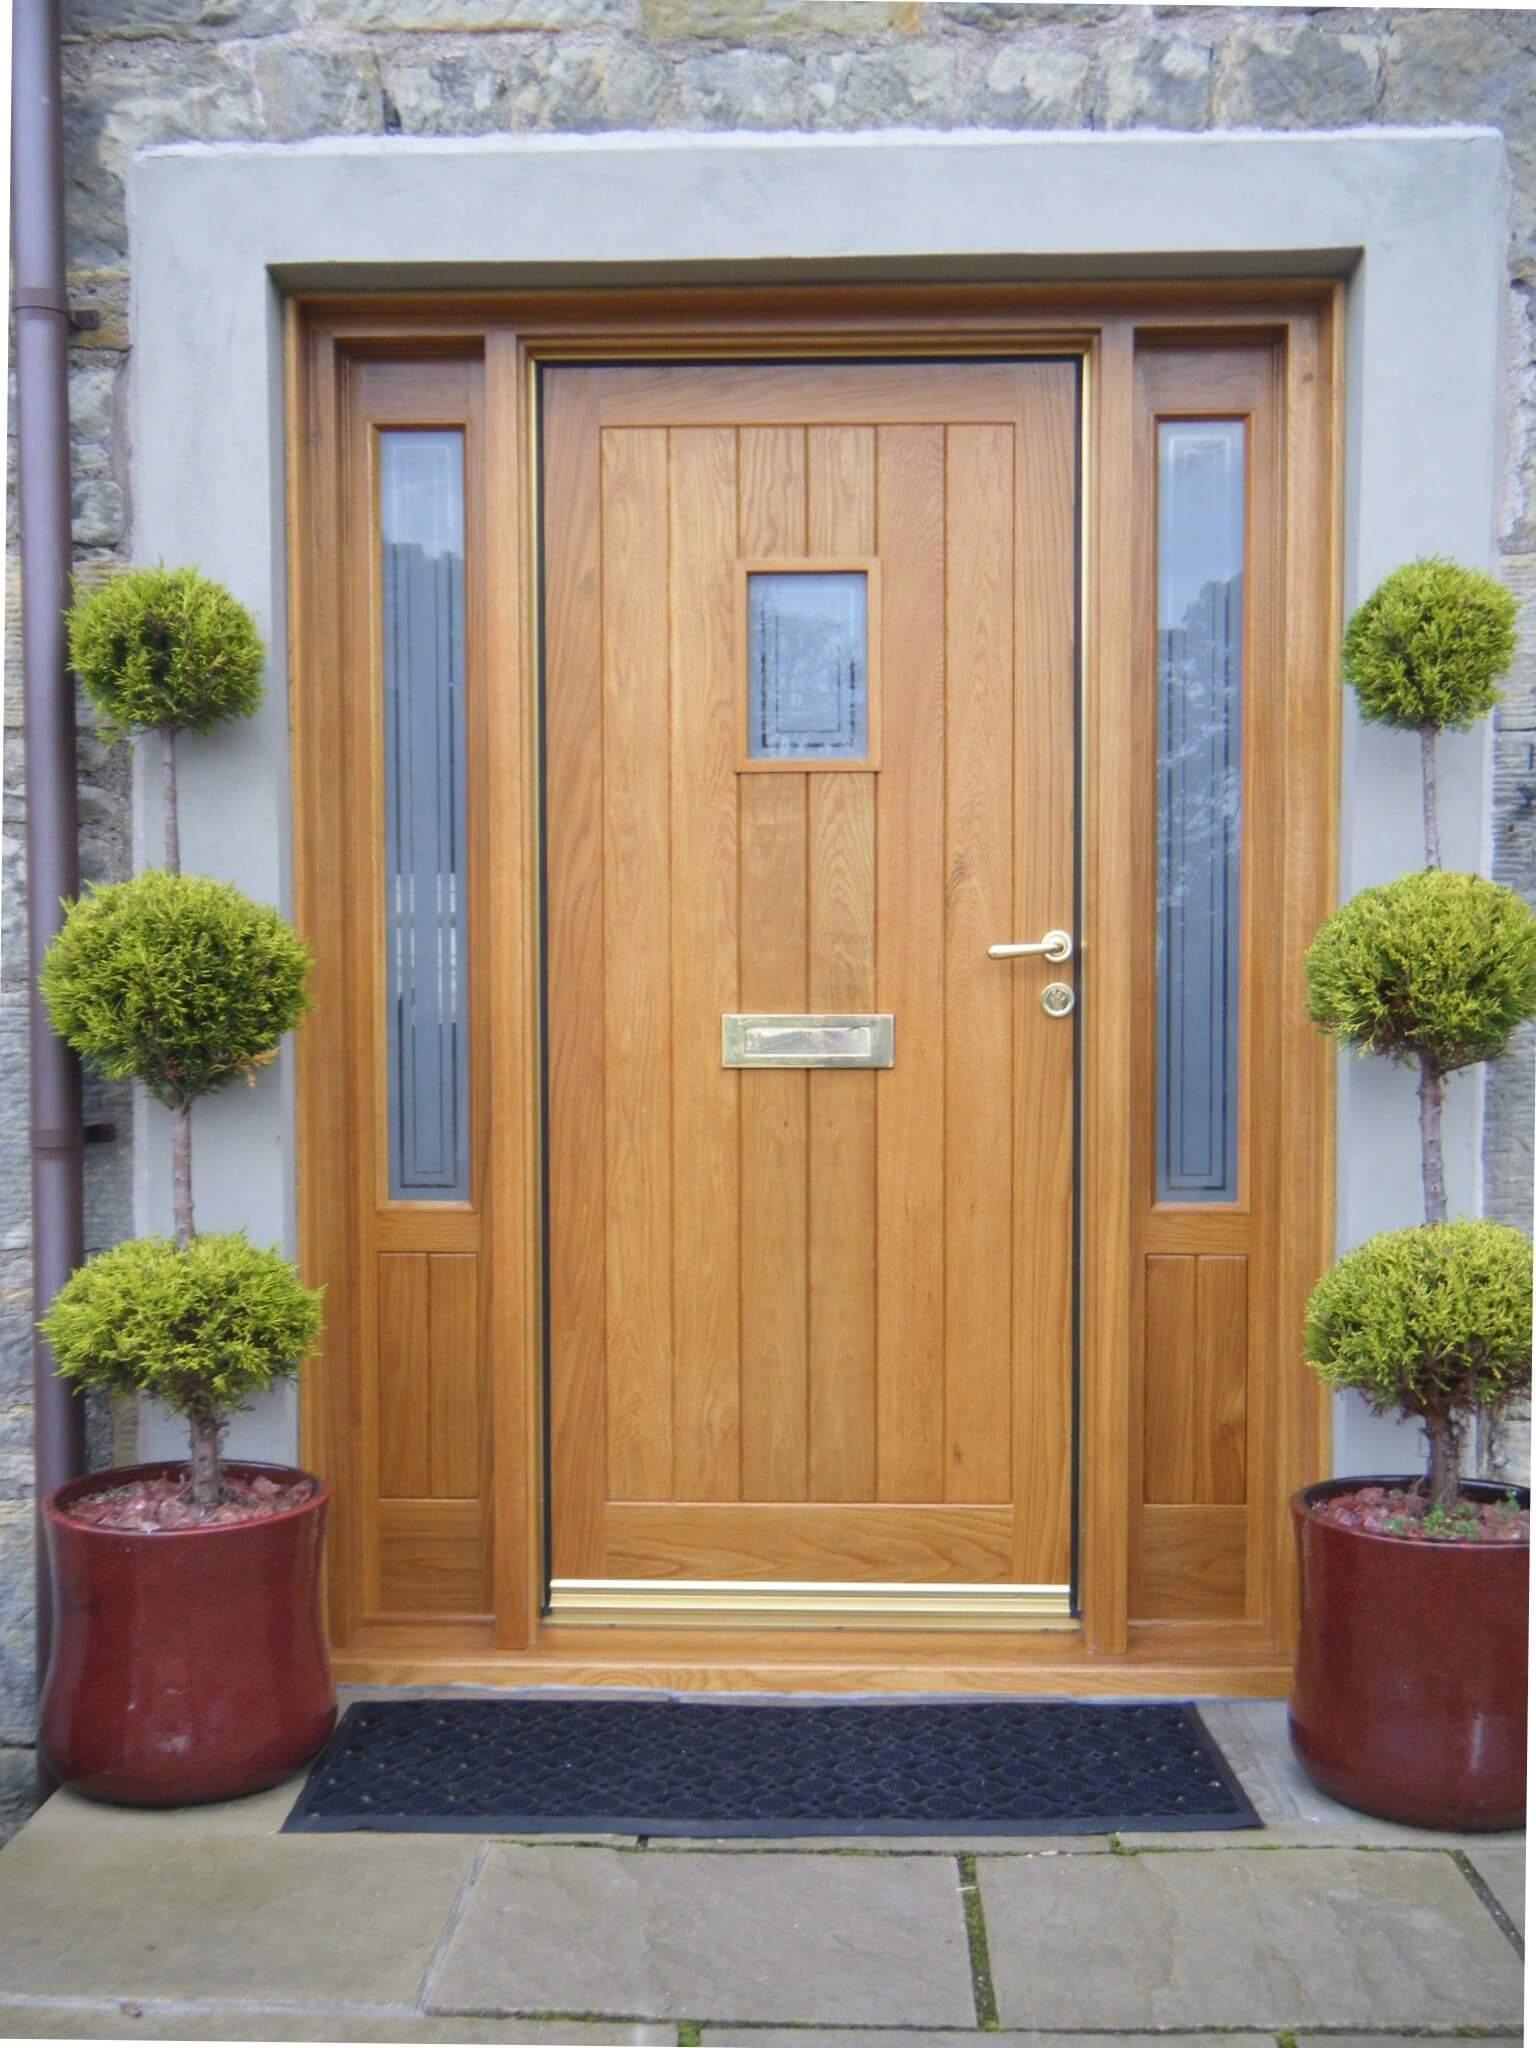 30 Best Front Door Color Ideas and Designs for 2020 on Door Color Ideas  id=31506